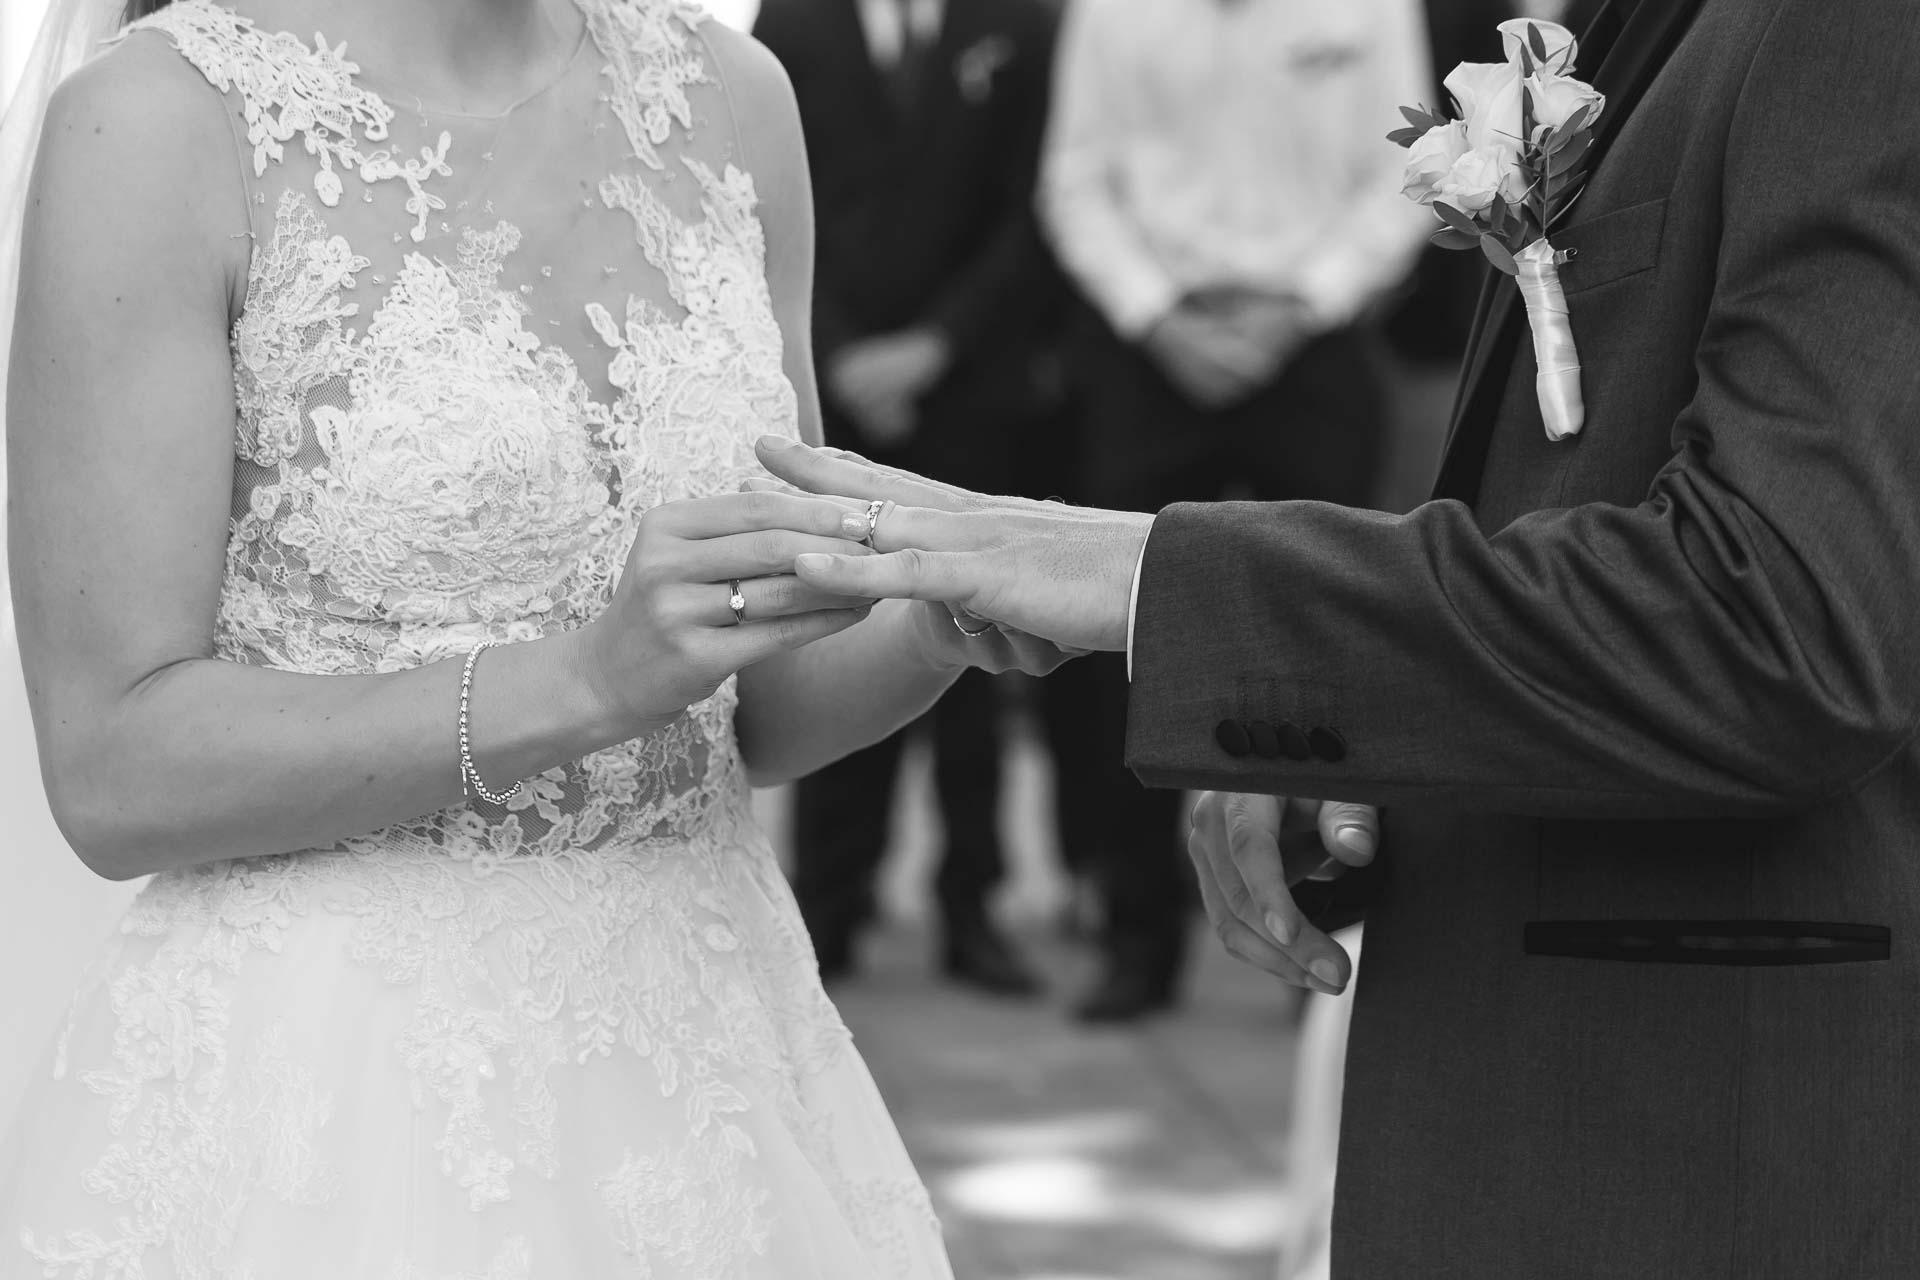 svatební-fotograf-svatebni-video-Nymburk-hotel-Ostrov-Beautyfoto-5176